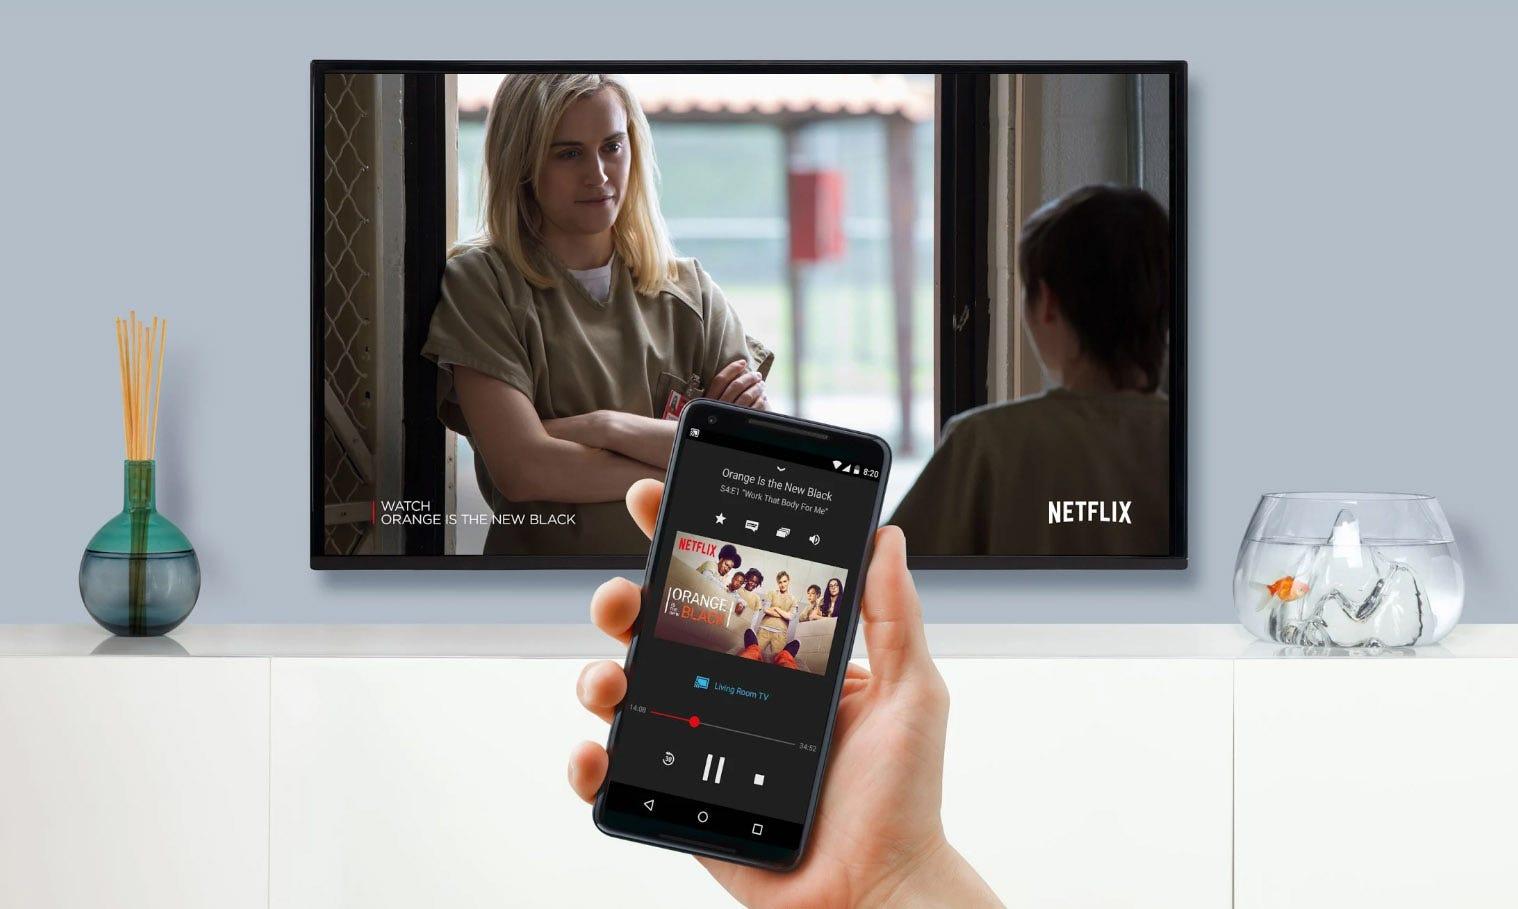 A man's hand holding a phone operating Netflix on a big screen smart TV.